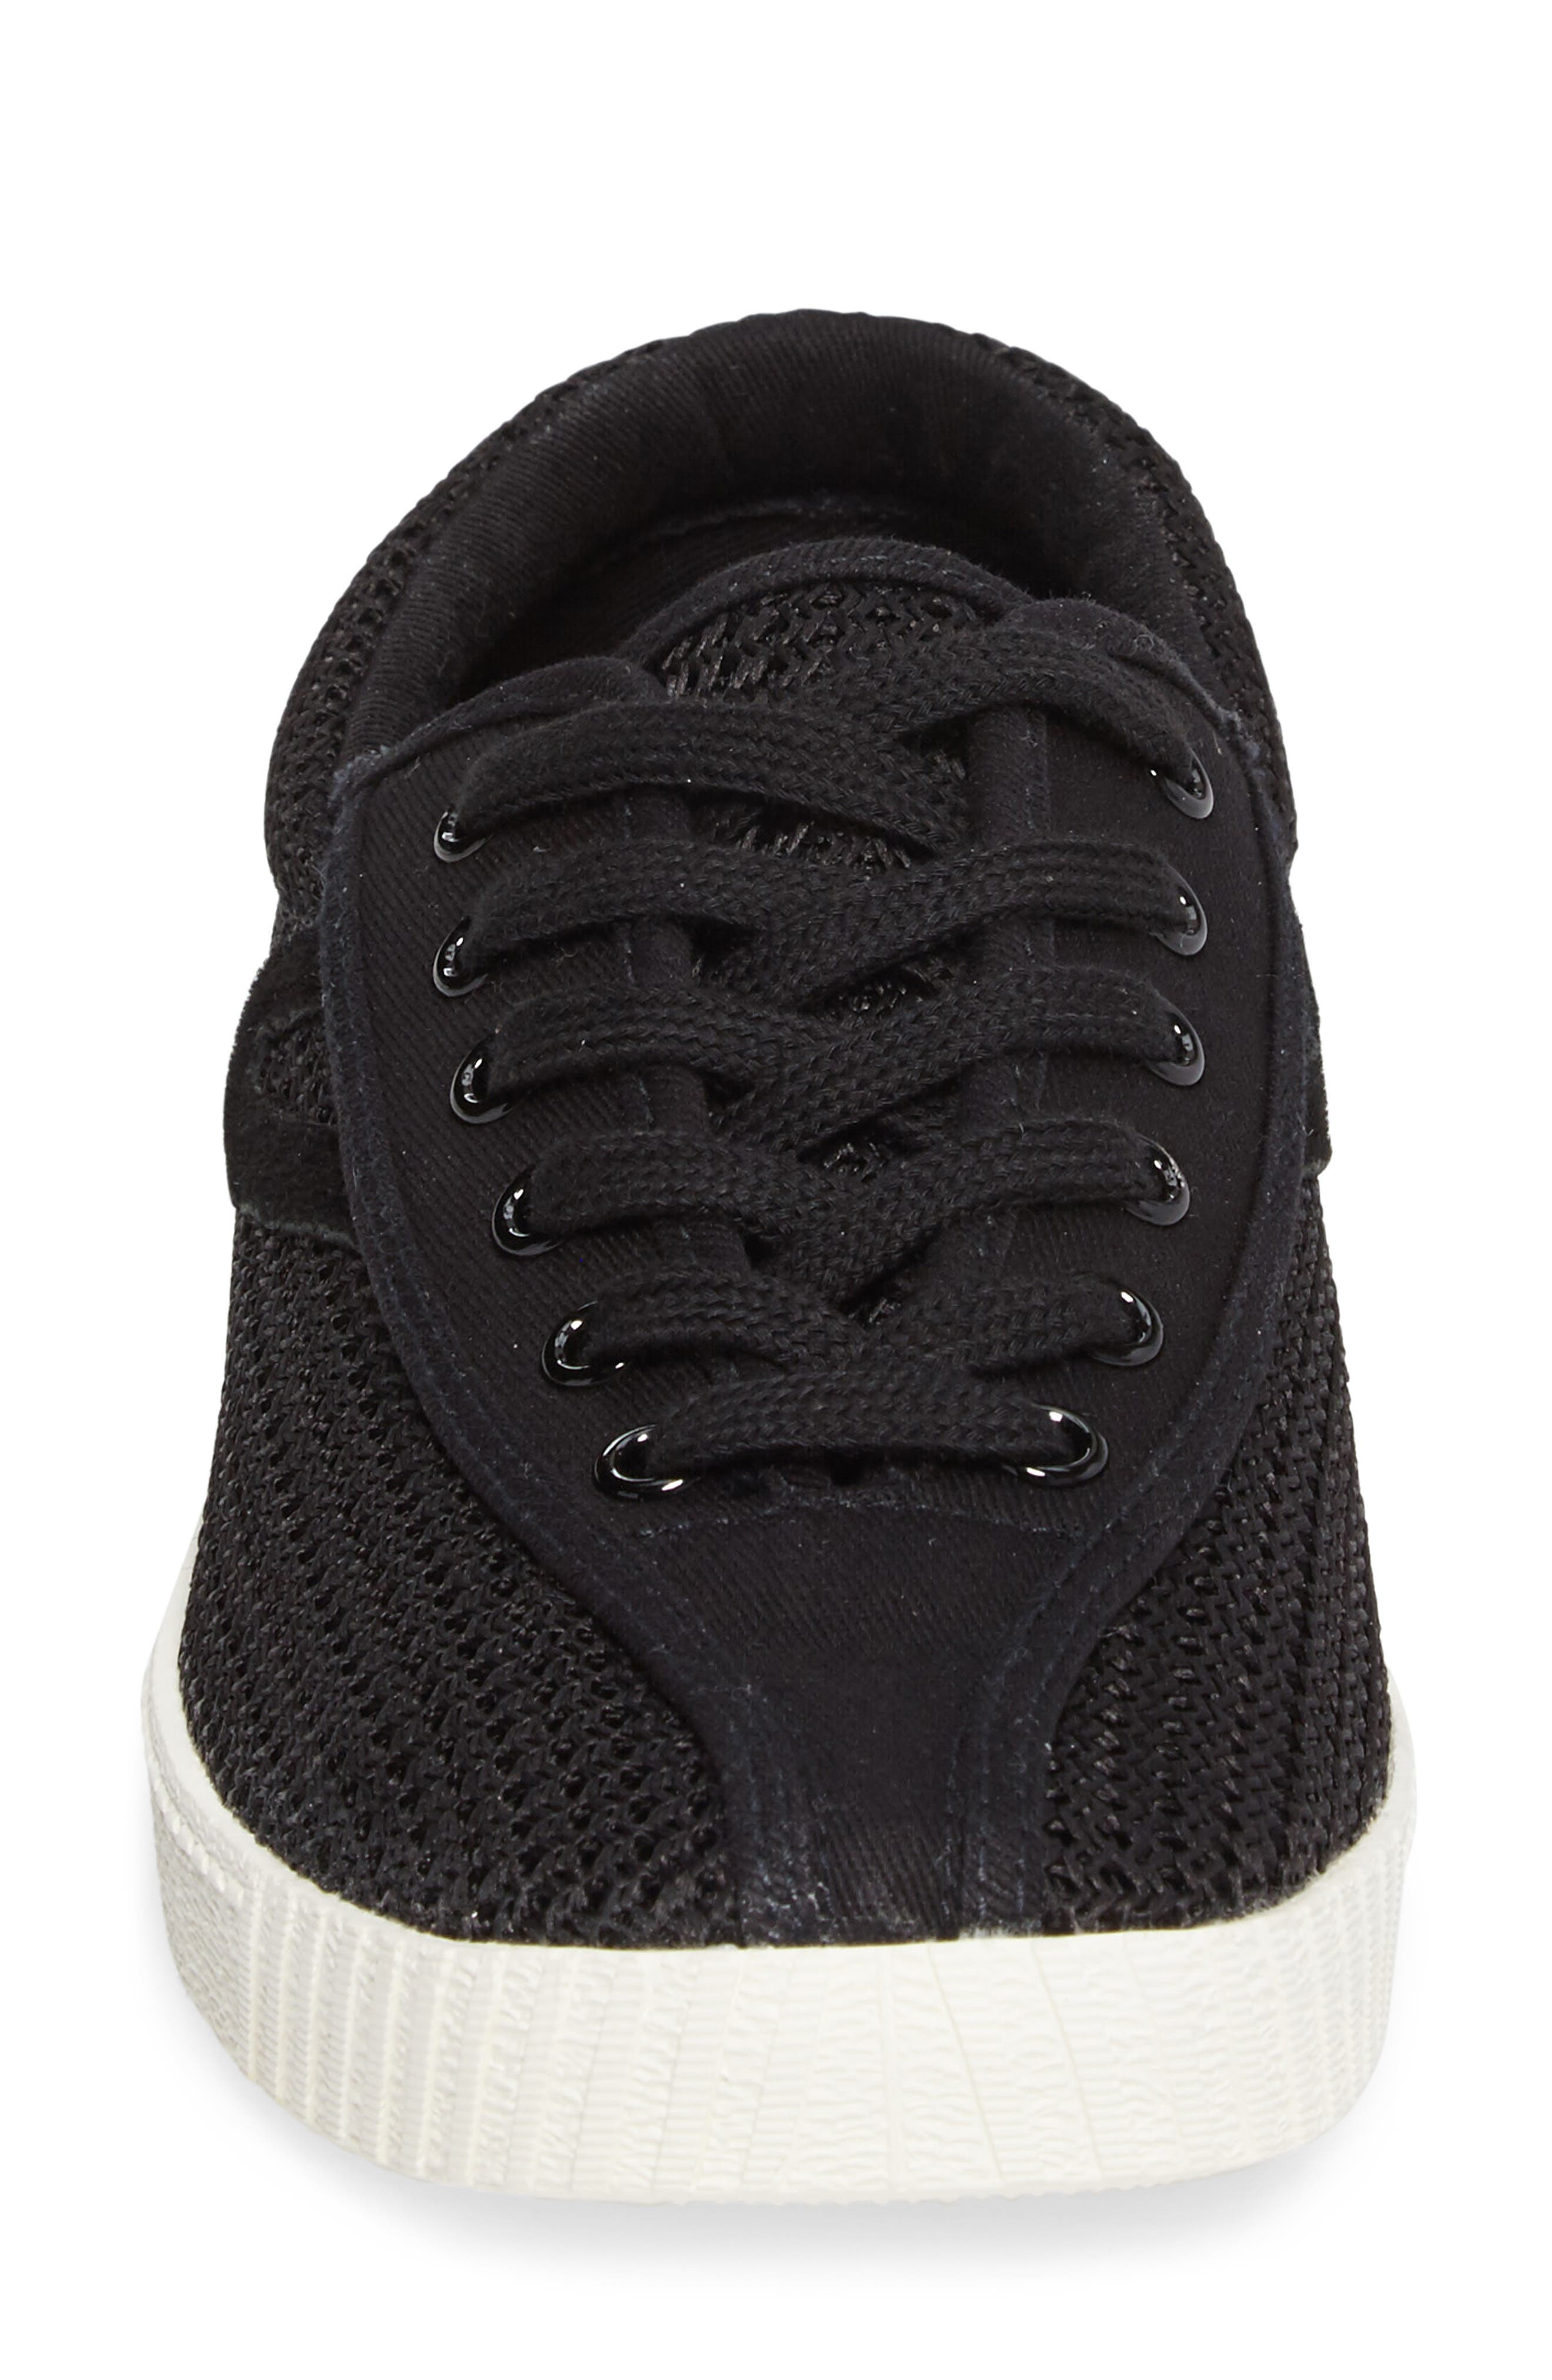 Nylite Sneaker,                             Alternate thumbnail 4, color,                             001